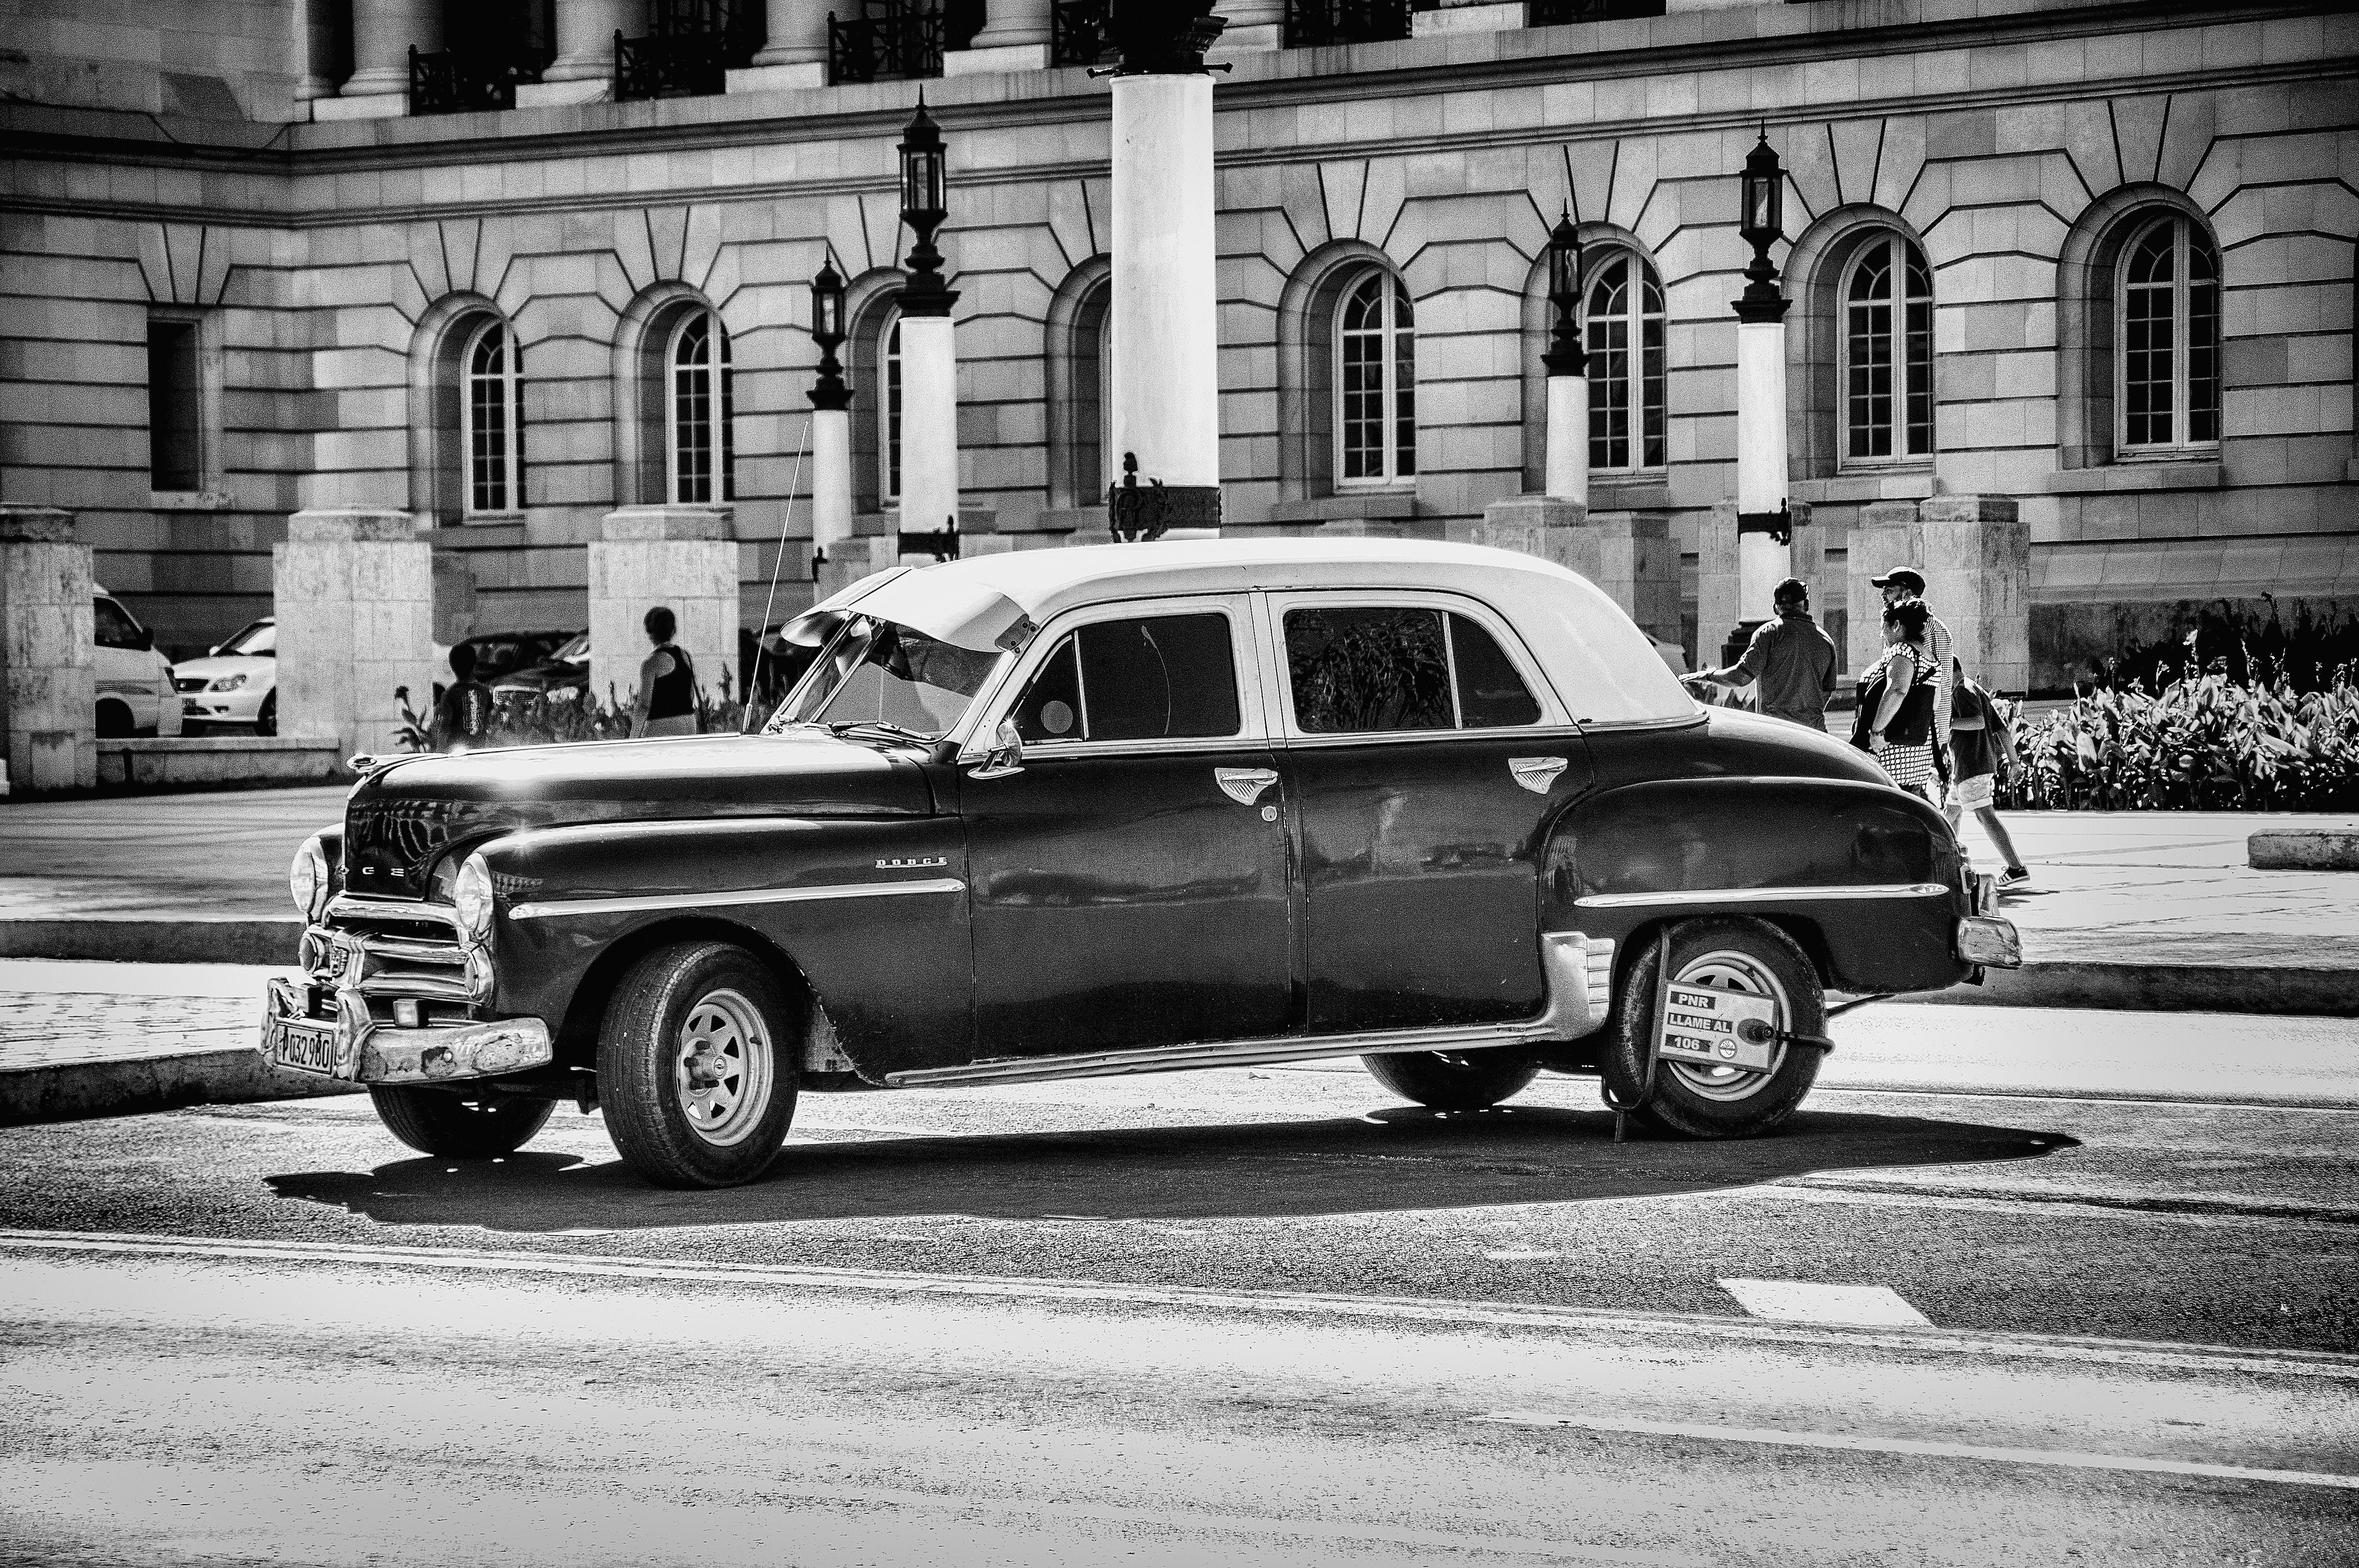 Grayscale Photo of Classic Chevrolet Sedan